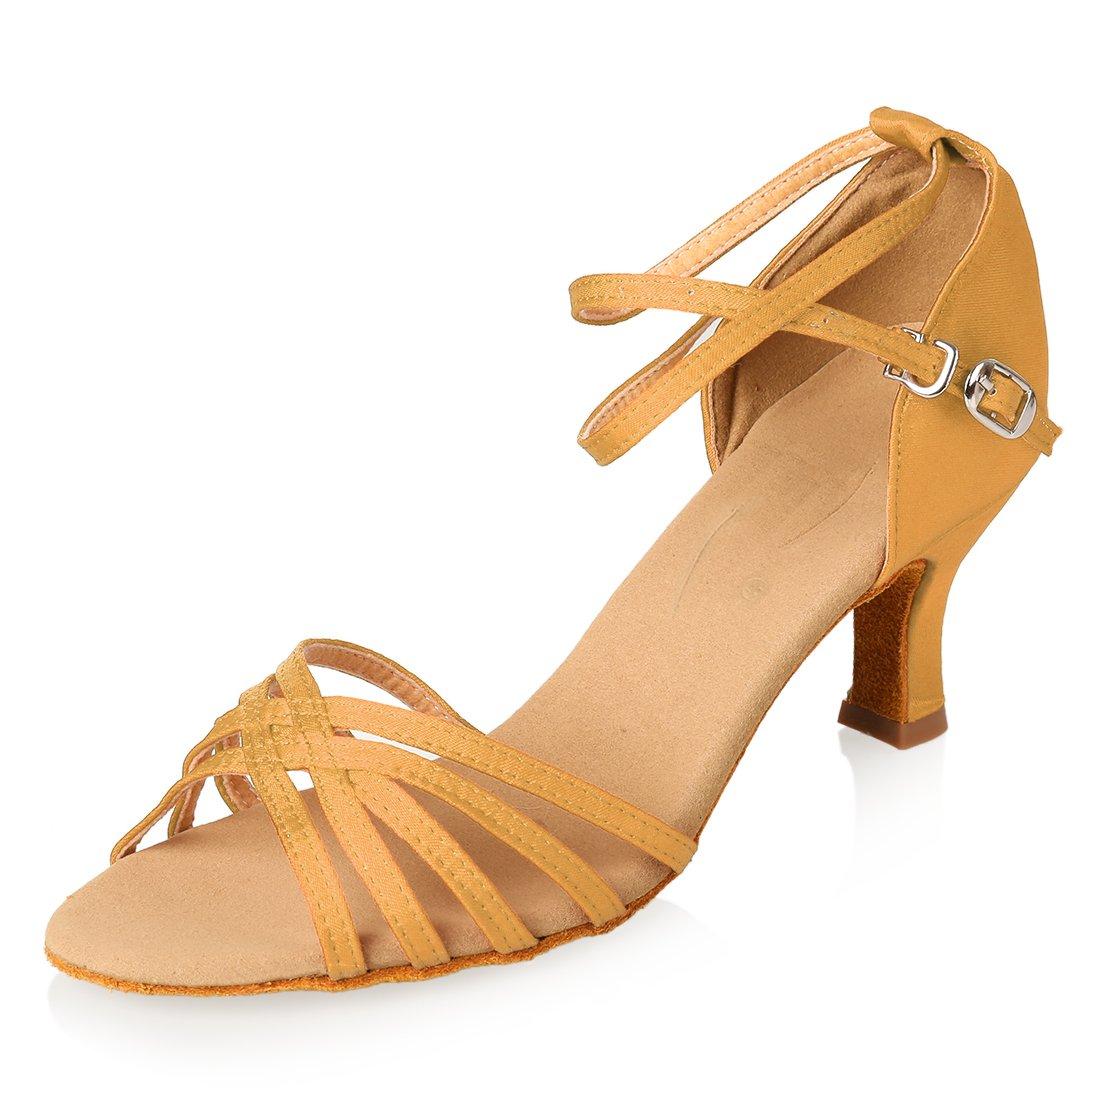 APTRO Damen Schuhe Tanzschuhe Ballsaal Latin Tanzen Silber Sandalen  375 EU|Gleb